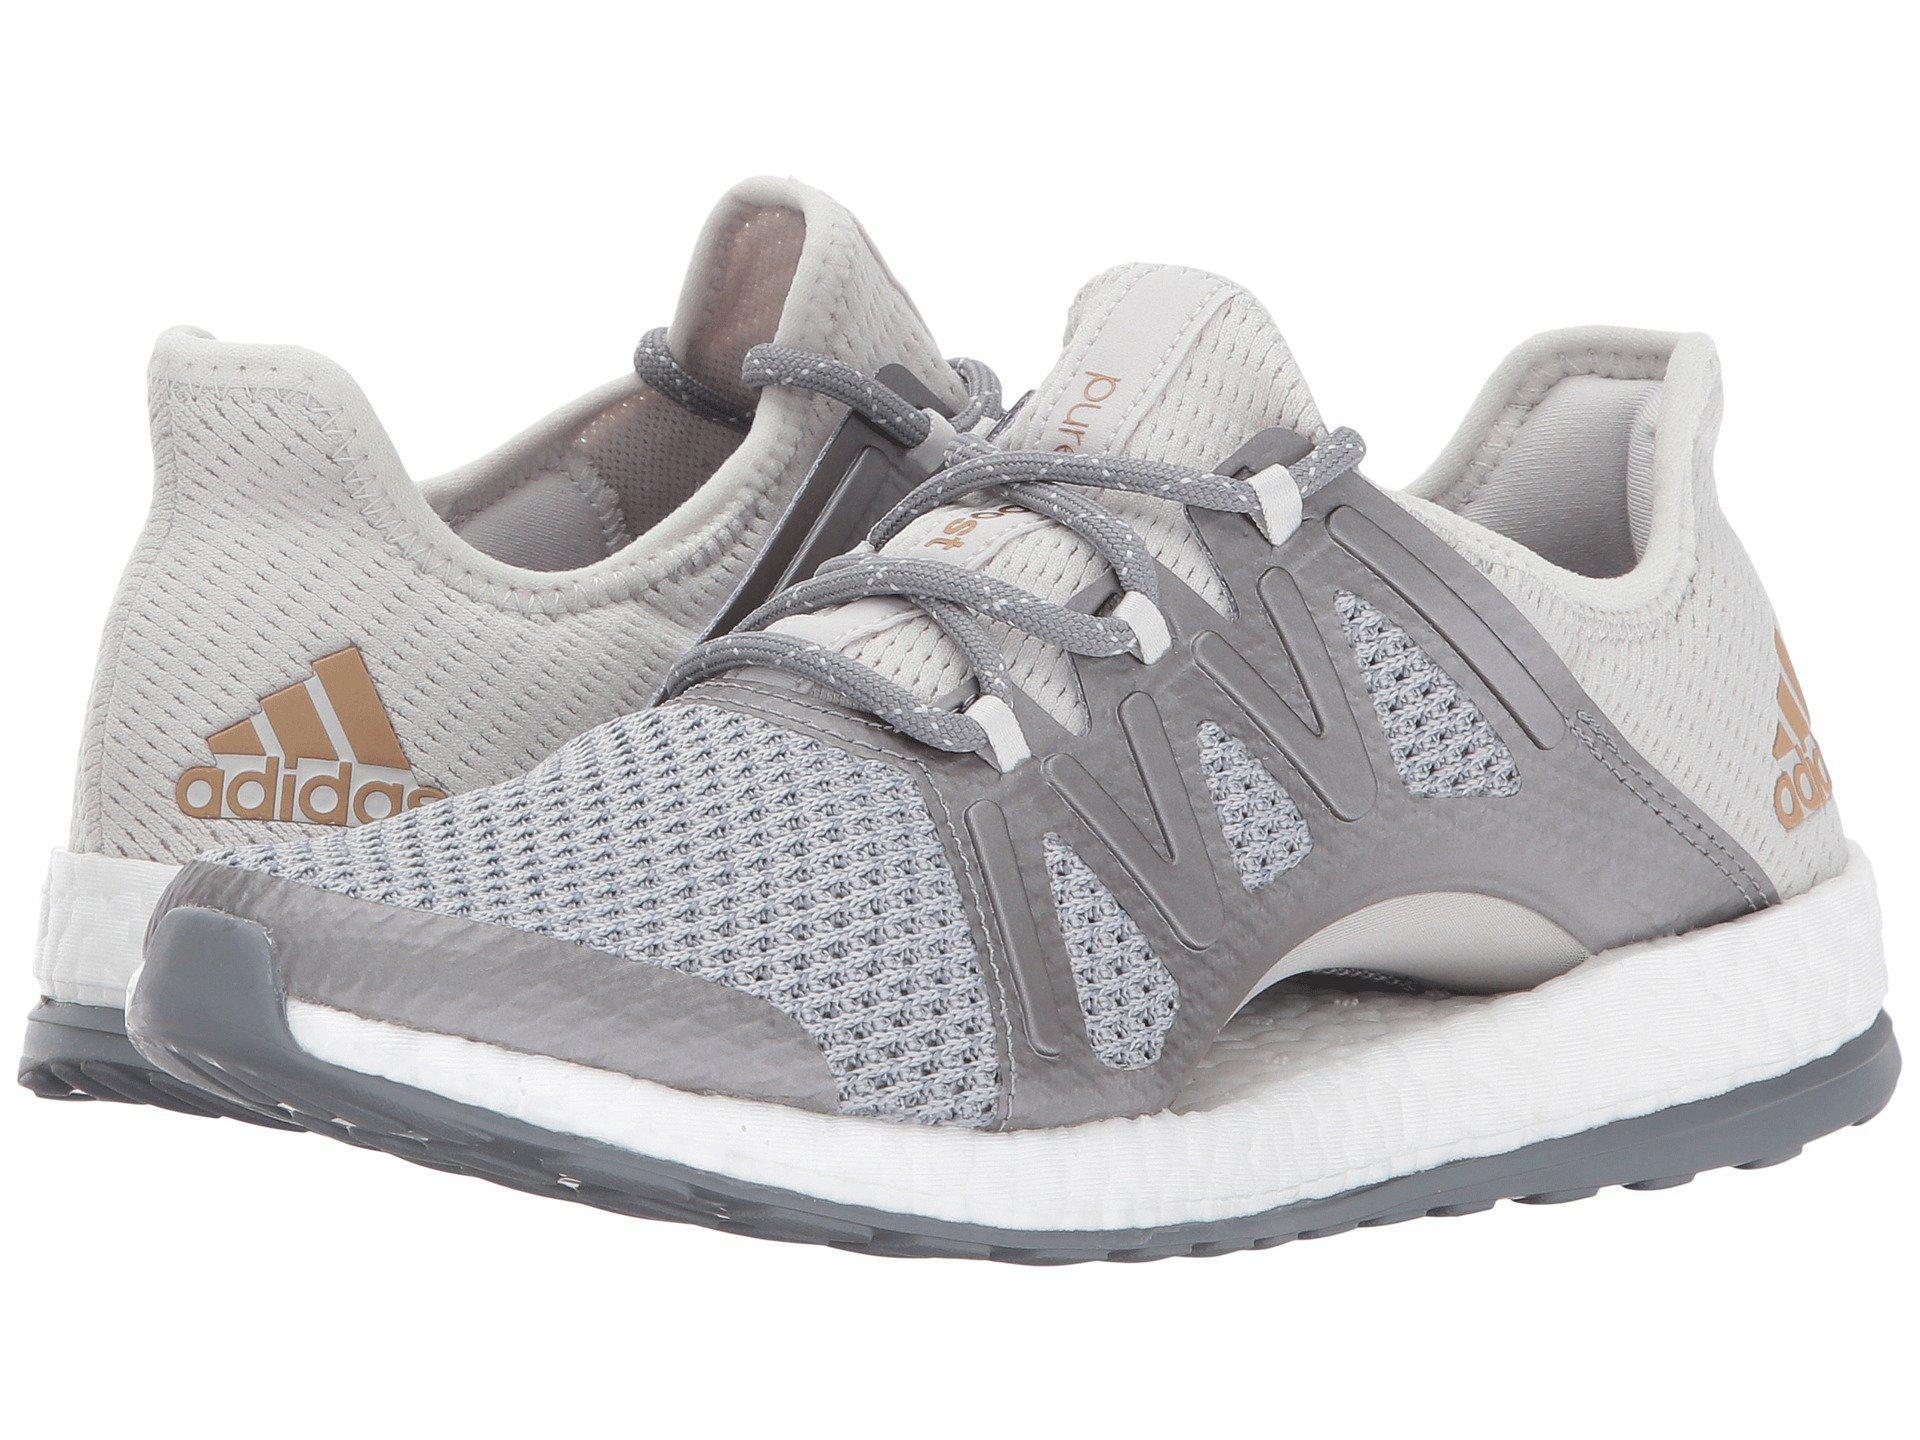 a7a318eaea1ea Lyst - adidas Originals Pureboost Xpose (core Black footwear White ...